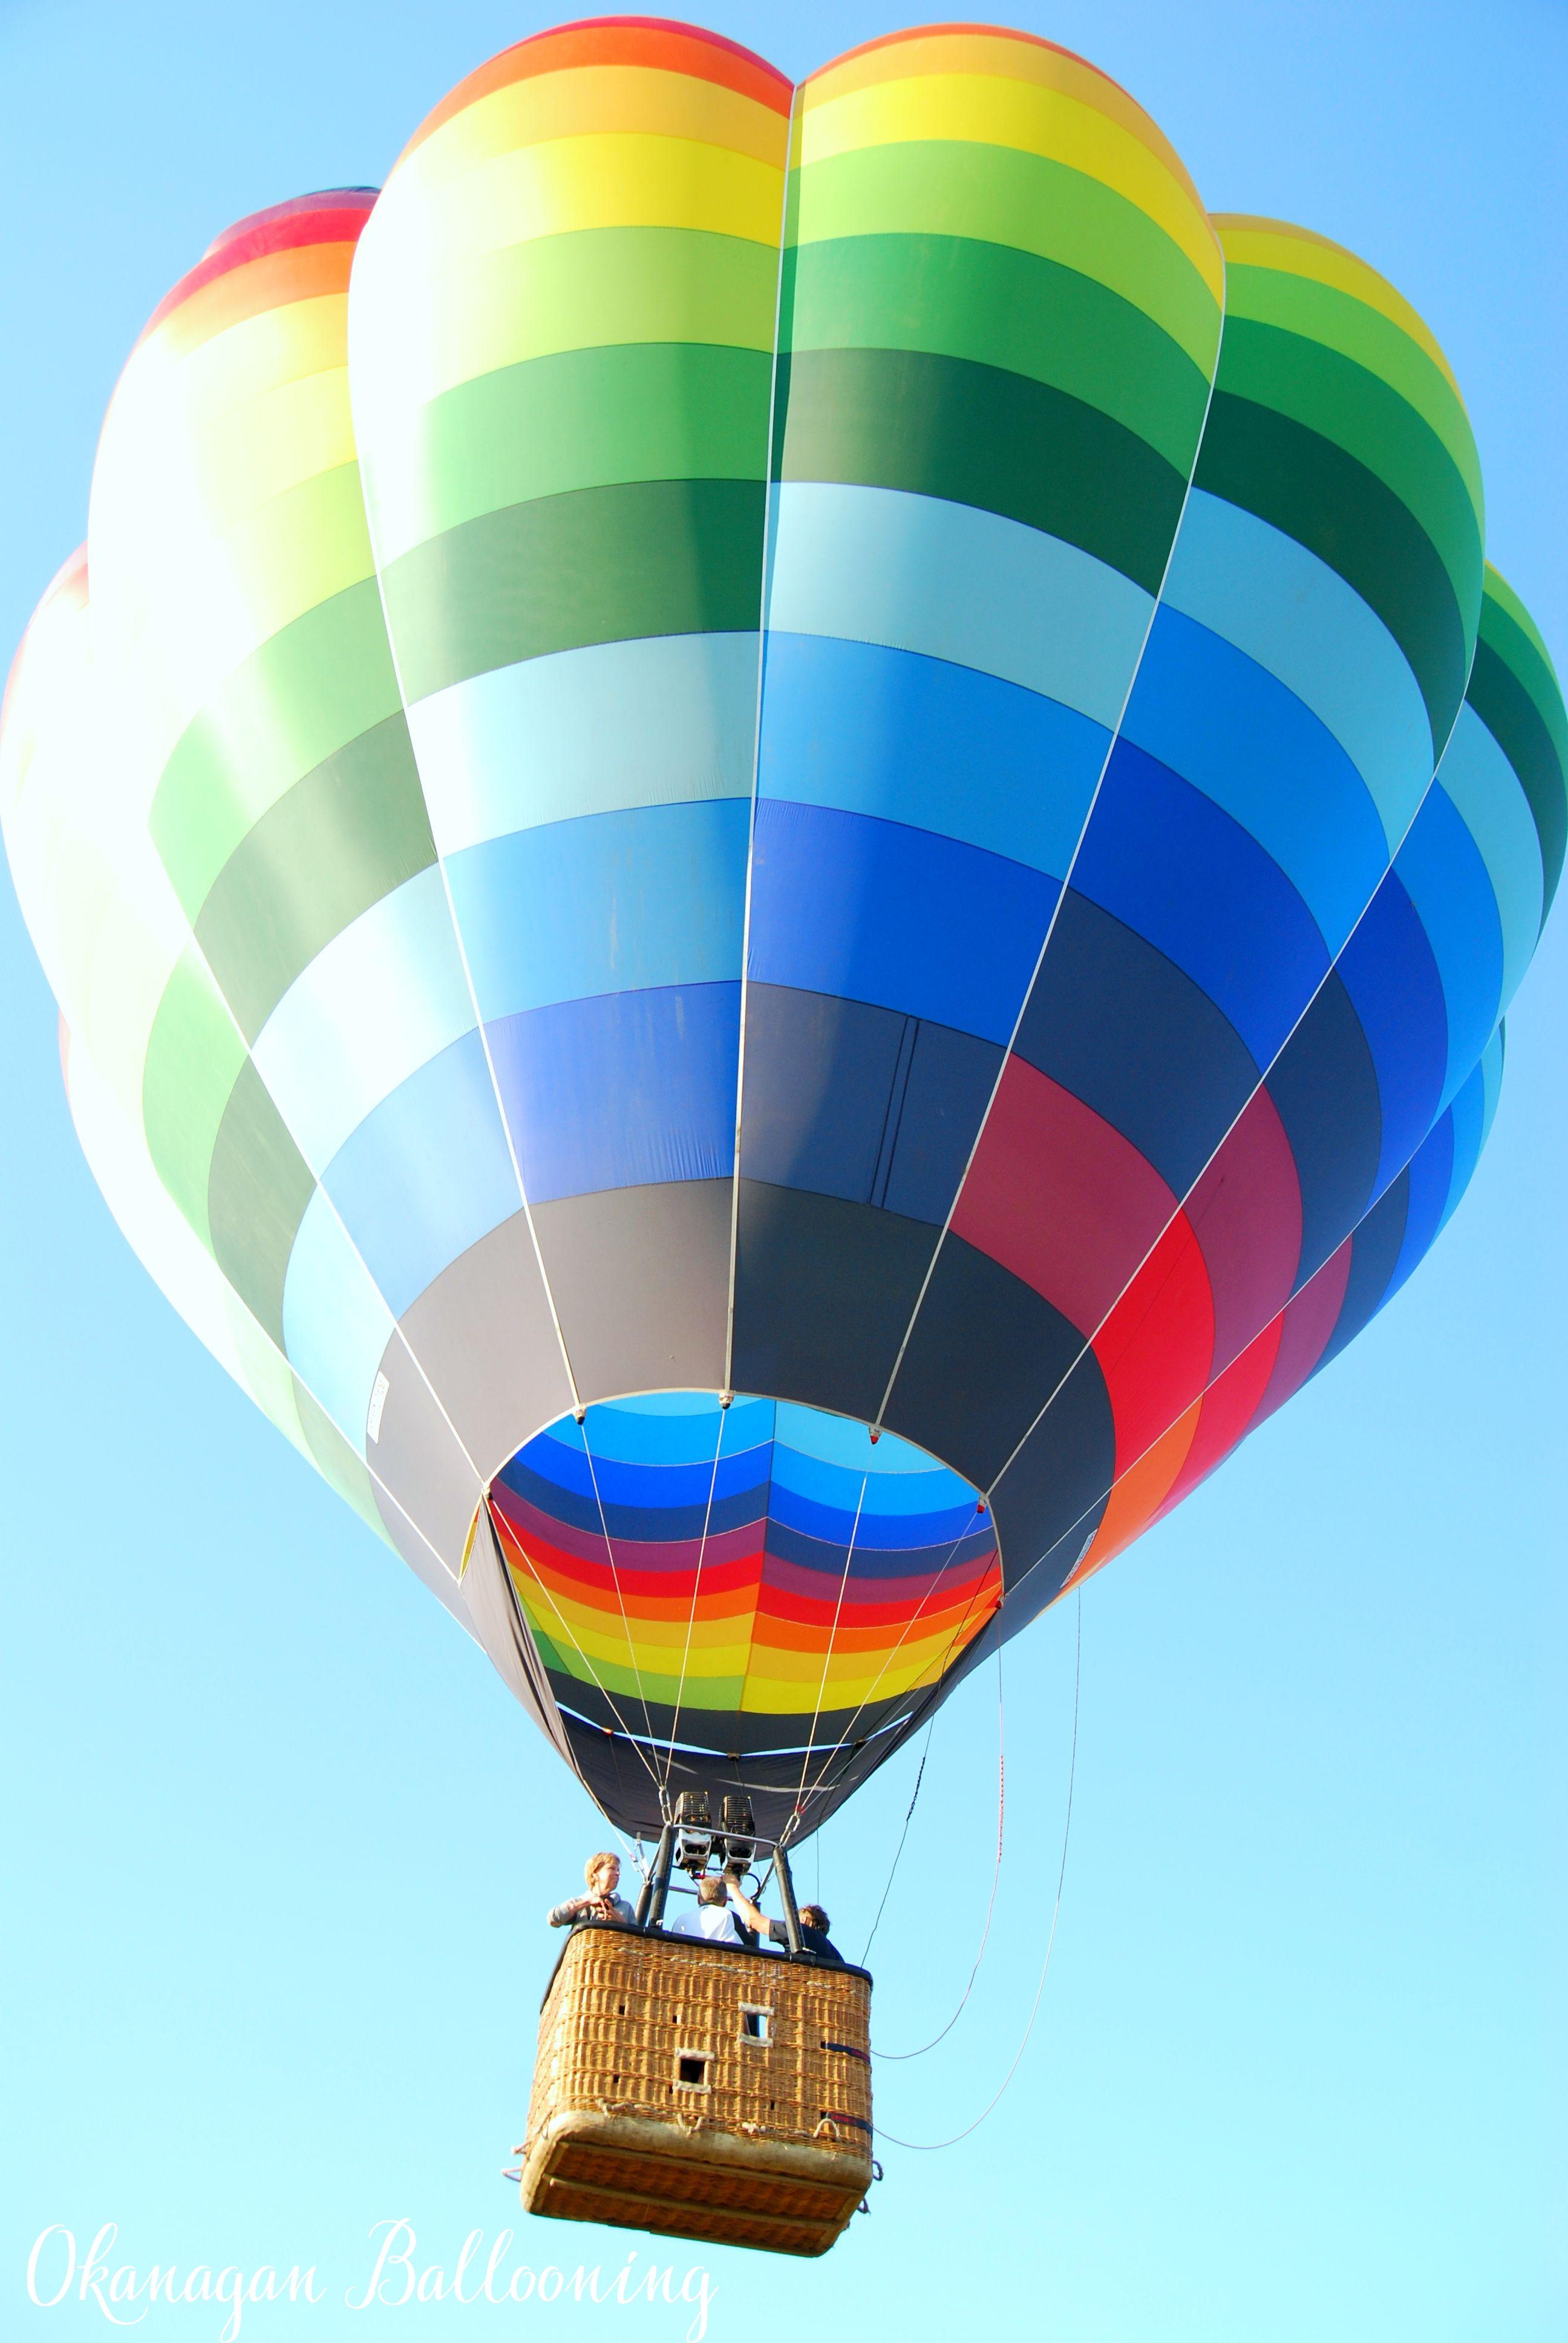 950x1534 Colorful Hot Air Balloons Festival Wallpaper Air Balloon Hot Air Hot Air Balloon